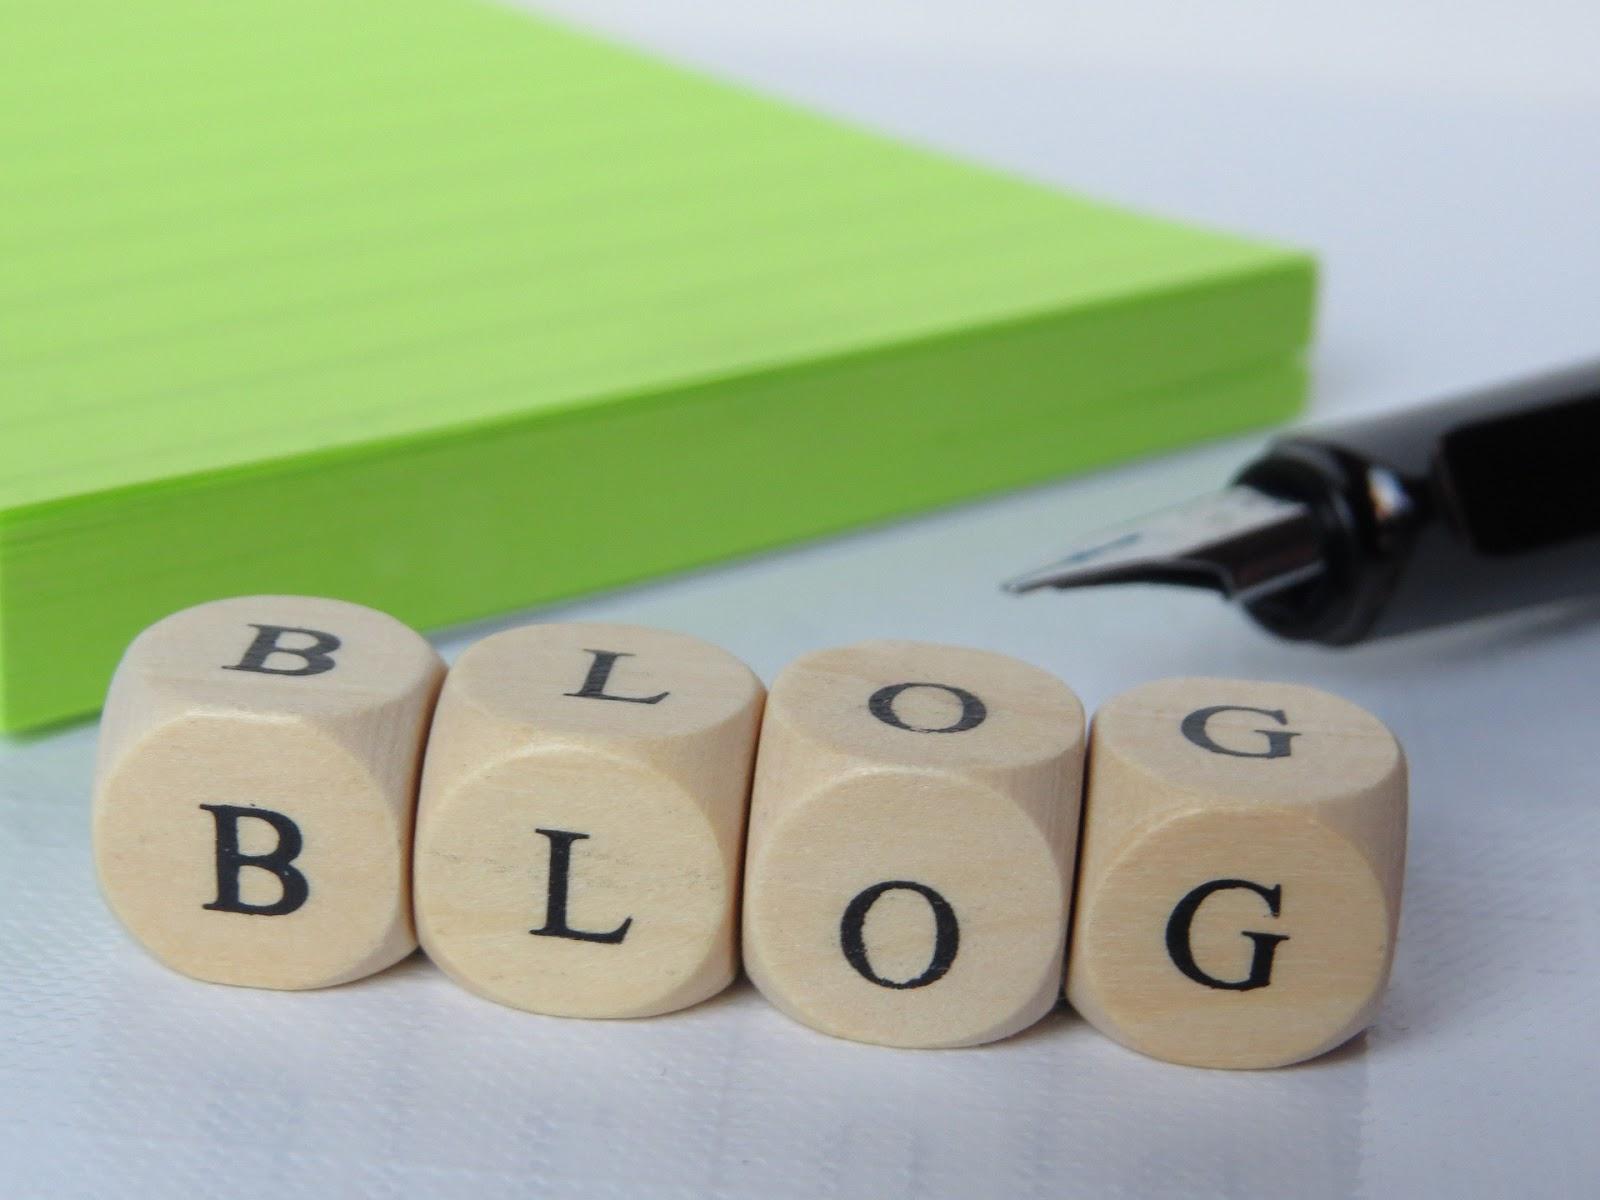 adsense bukan penentu suksesnya seorang blogger, kunci sukses seorang blogger, tips agar sukses menjadi seorang blogger,